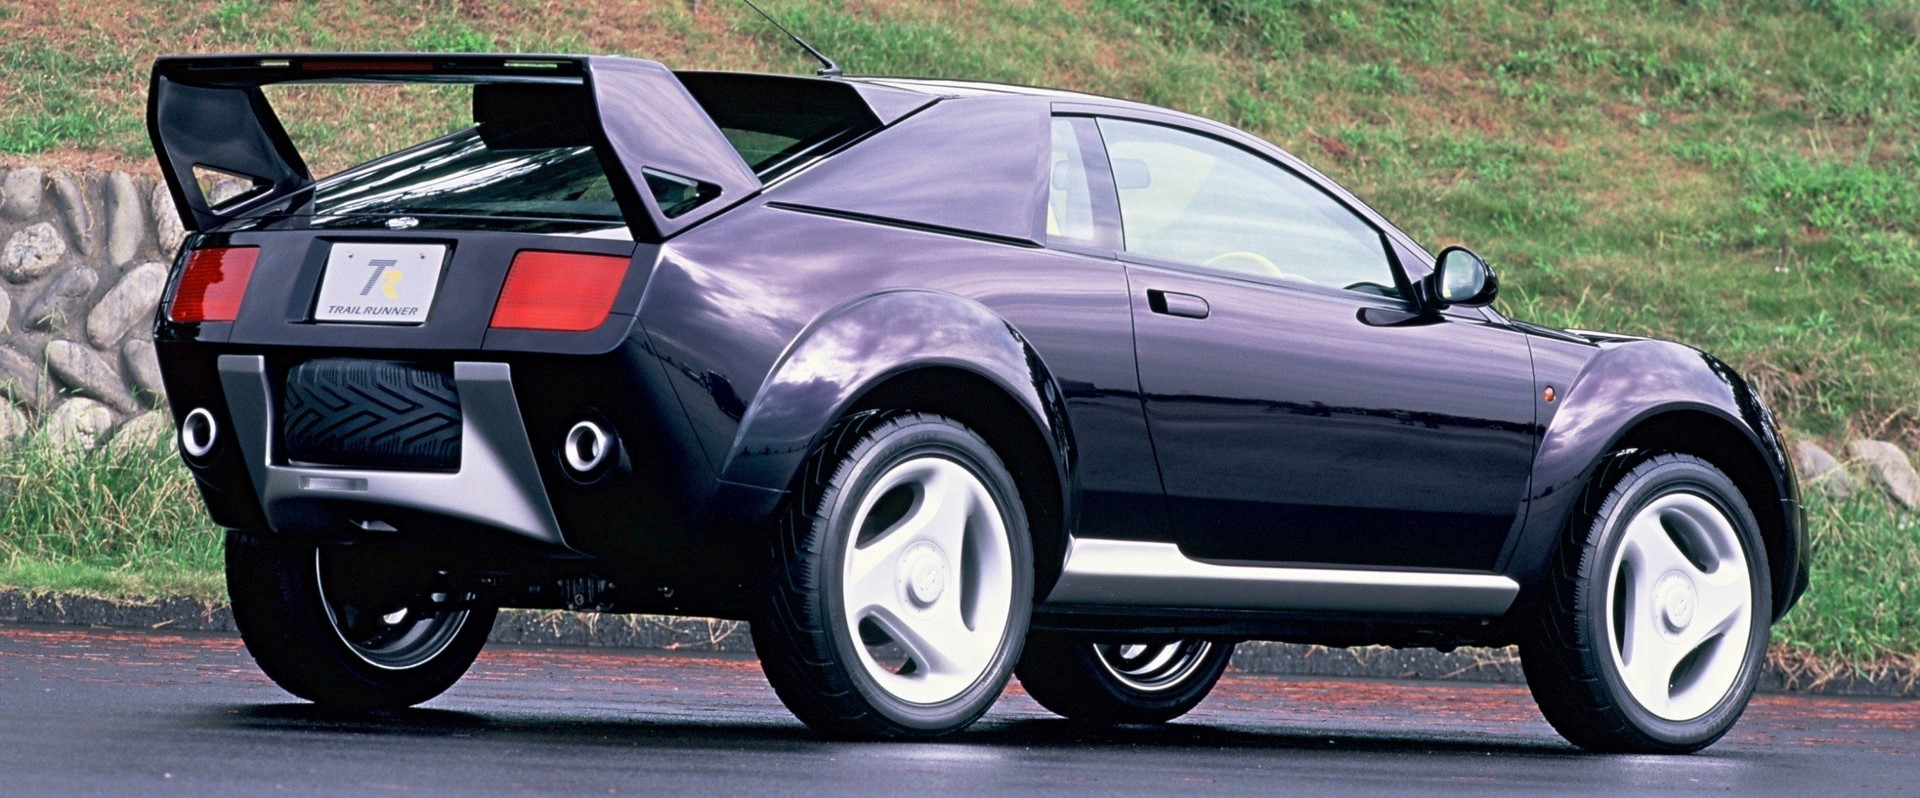 Nissan Trail Runner concept (11)